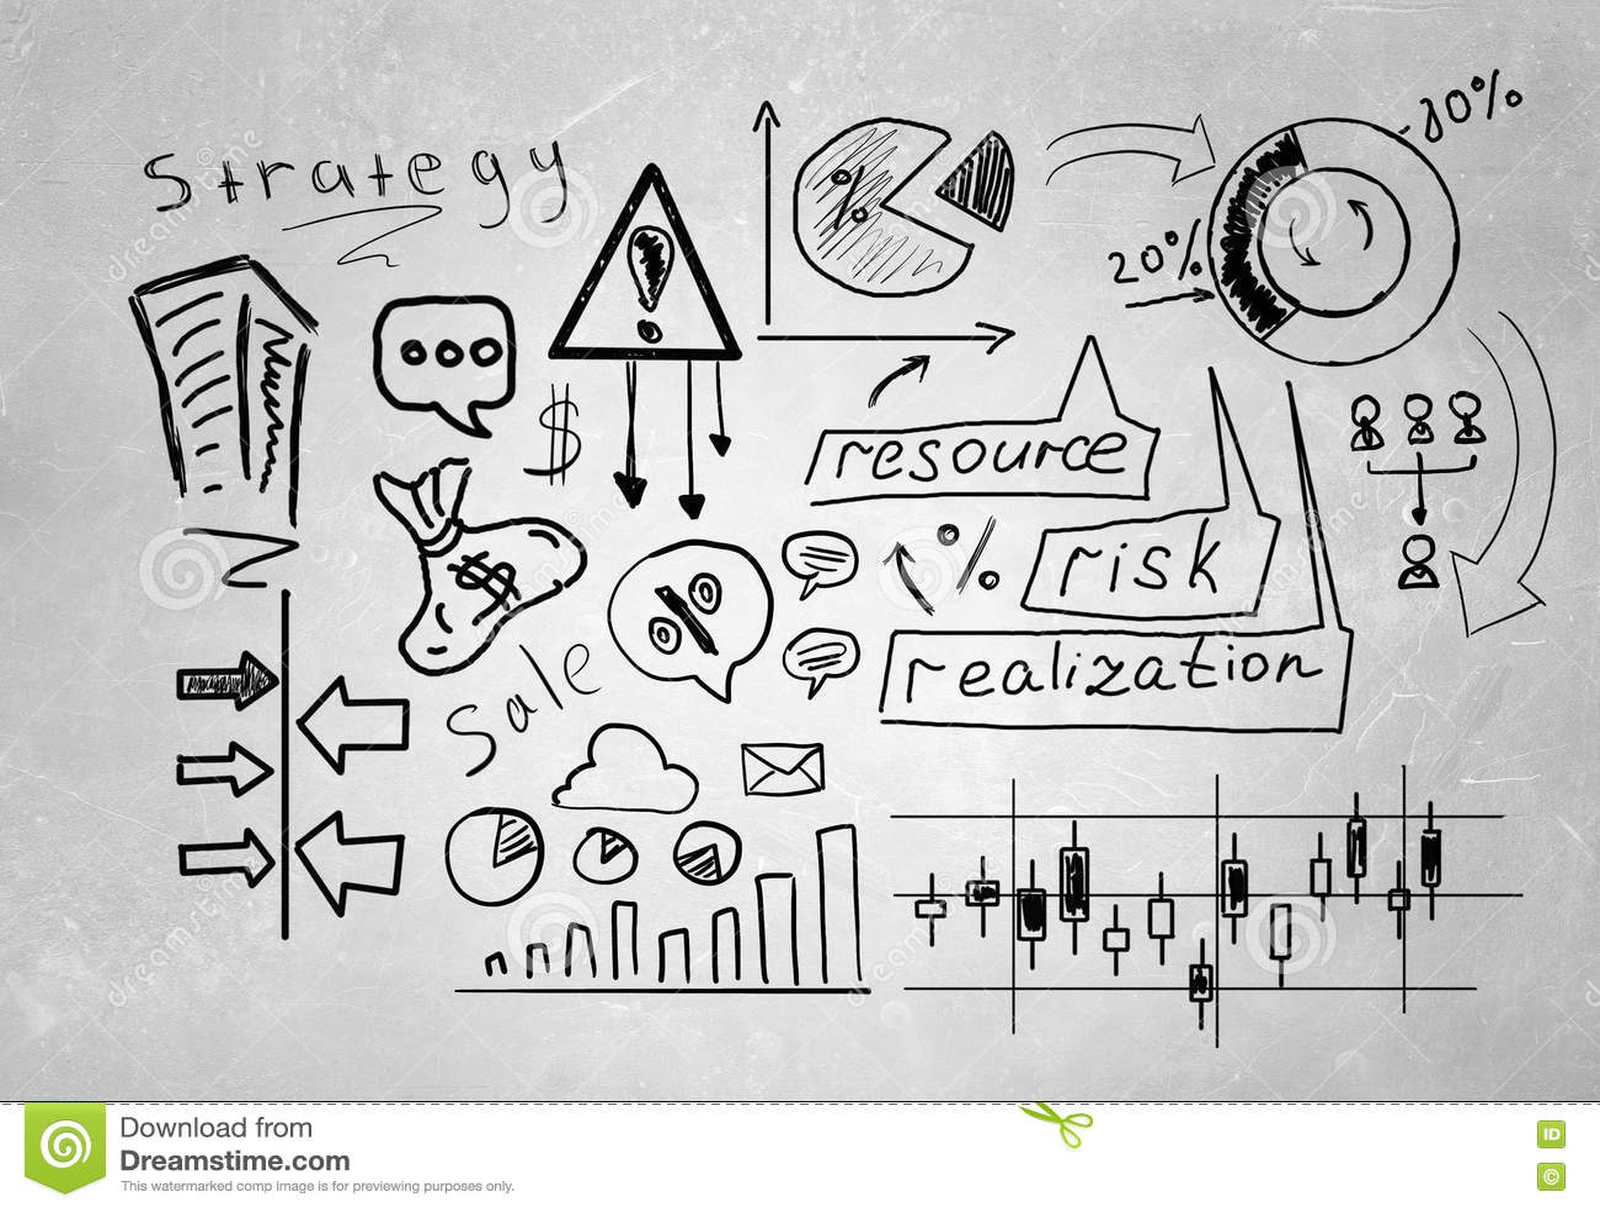 Скачать бизнес план сделанный бизнес план строительного склада